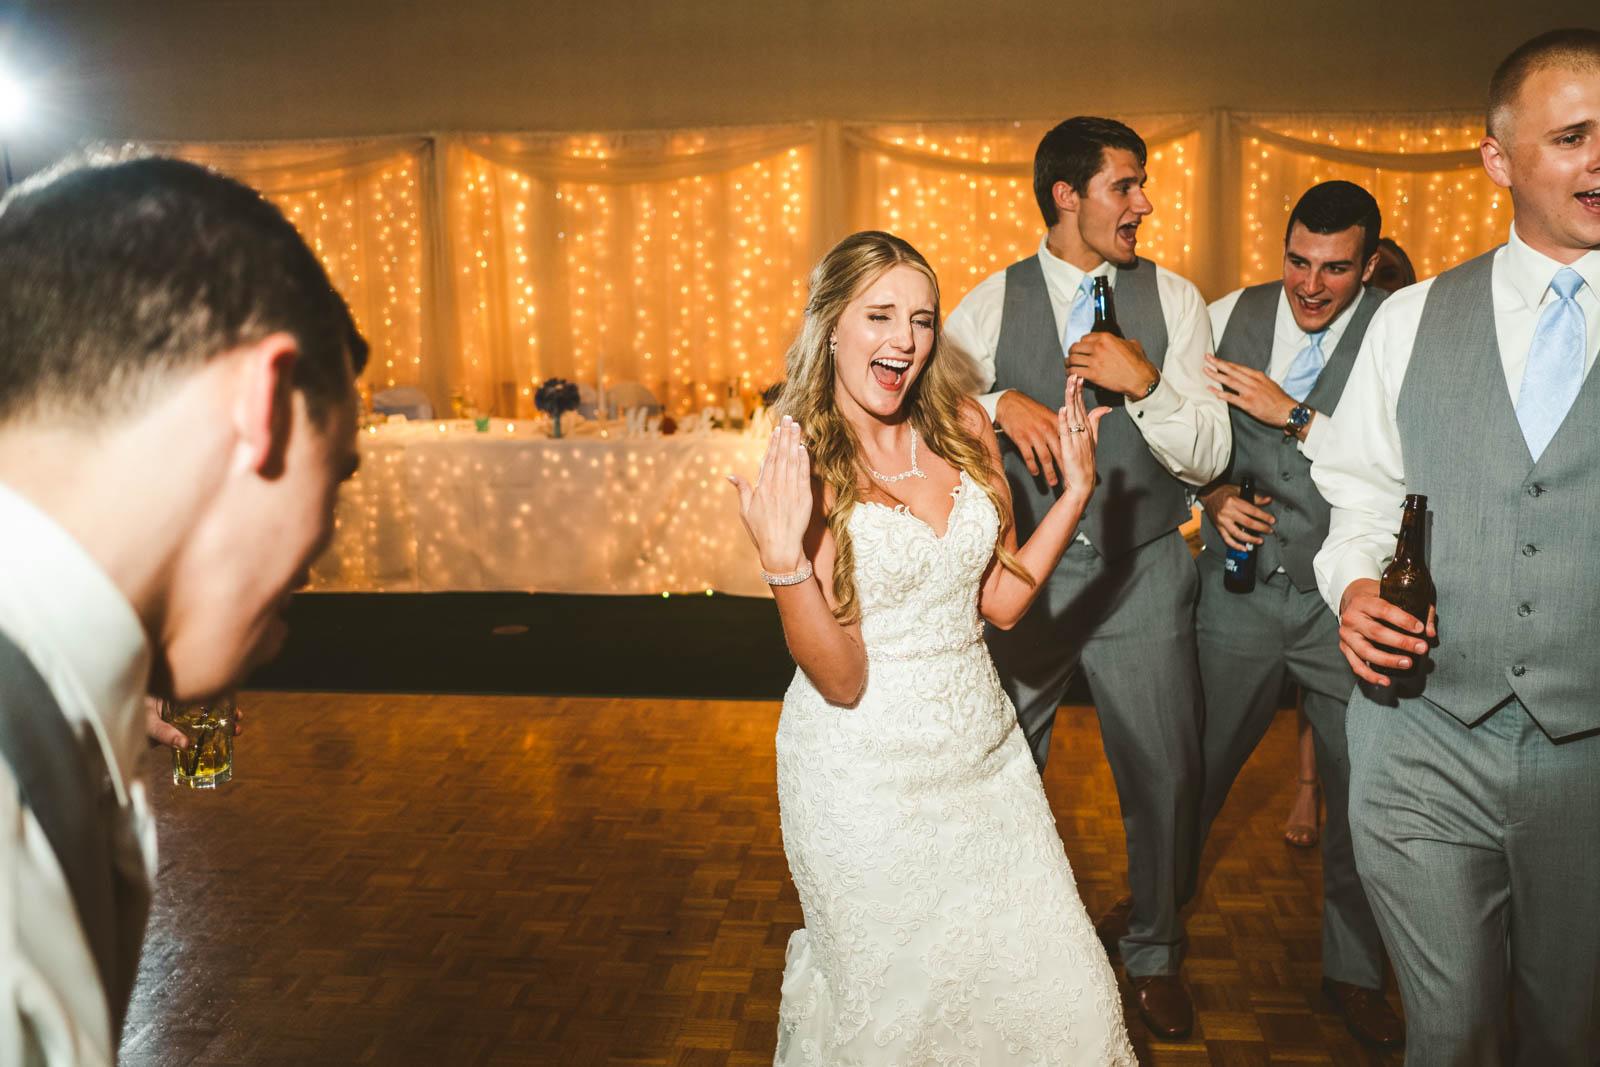 Bride at Wedding Reception Dancing at Stone Ridge Golf Club